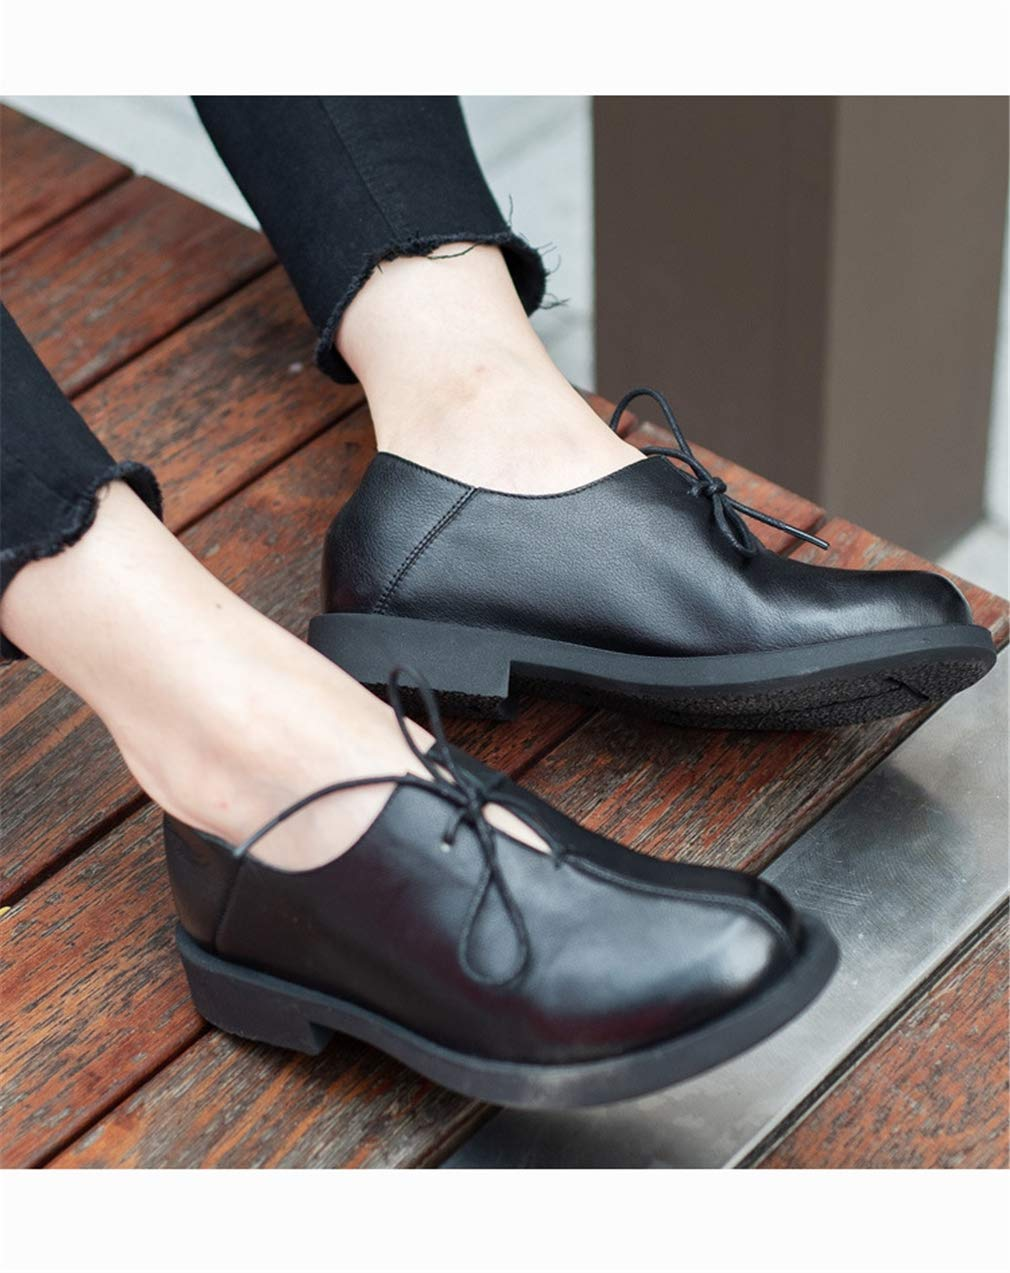 YAN Damenschuhe Frühlingshünfspiel Leder Low-Top Fashion Casual schuhe Fashion Low-Top Lace-Up Comfortschuhe Comfort Loafers A 36 7c93bb